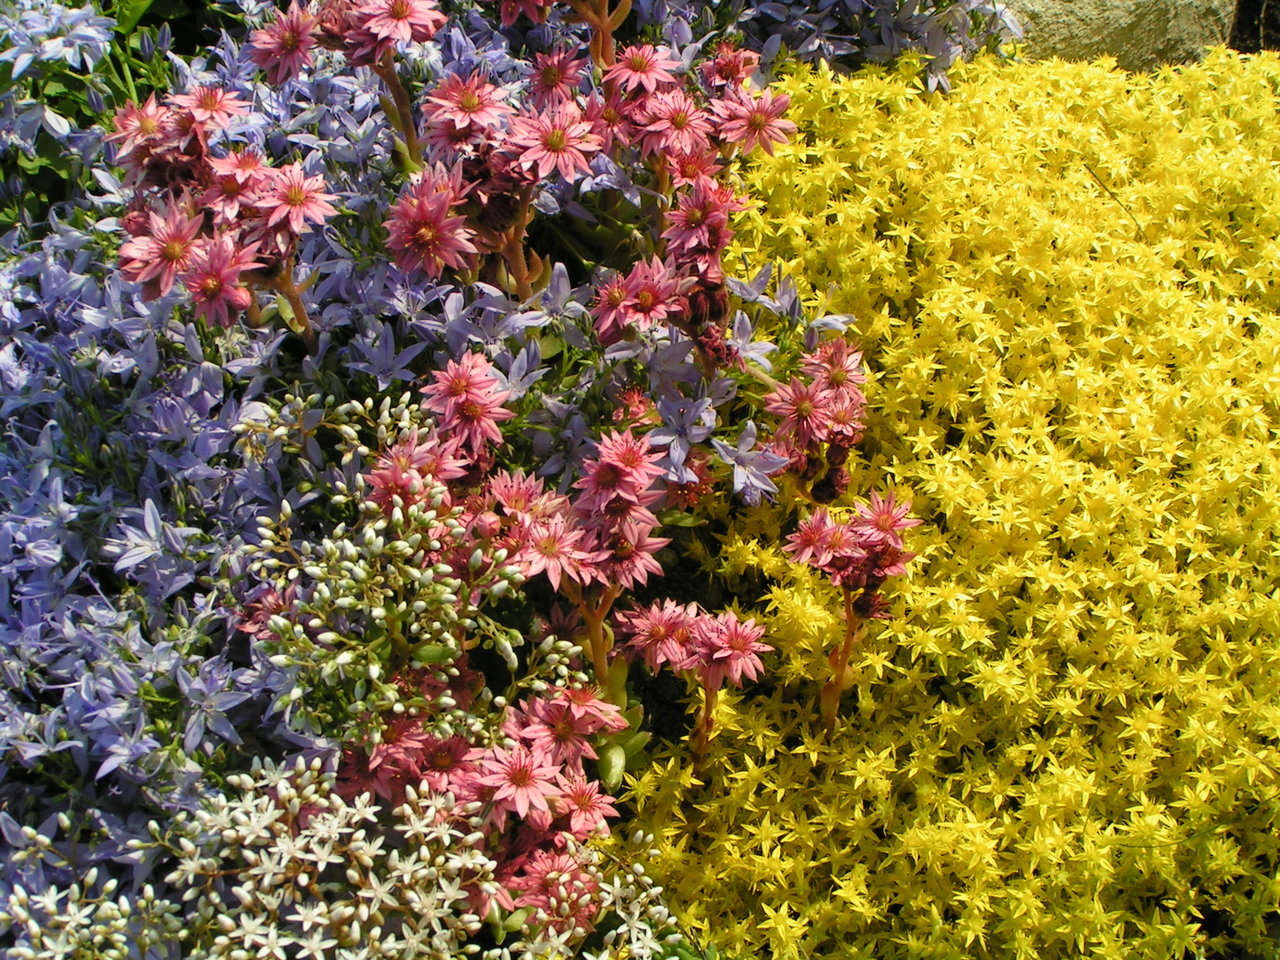 garden-flowers-1389057-1280x960.jpg